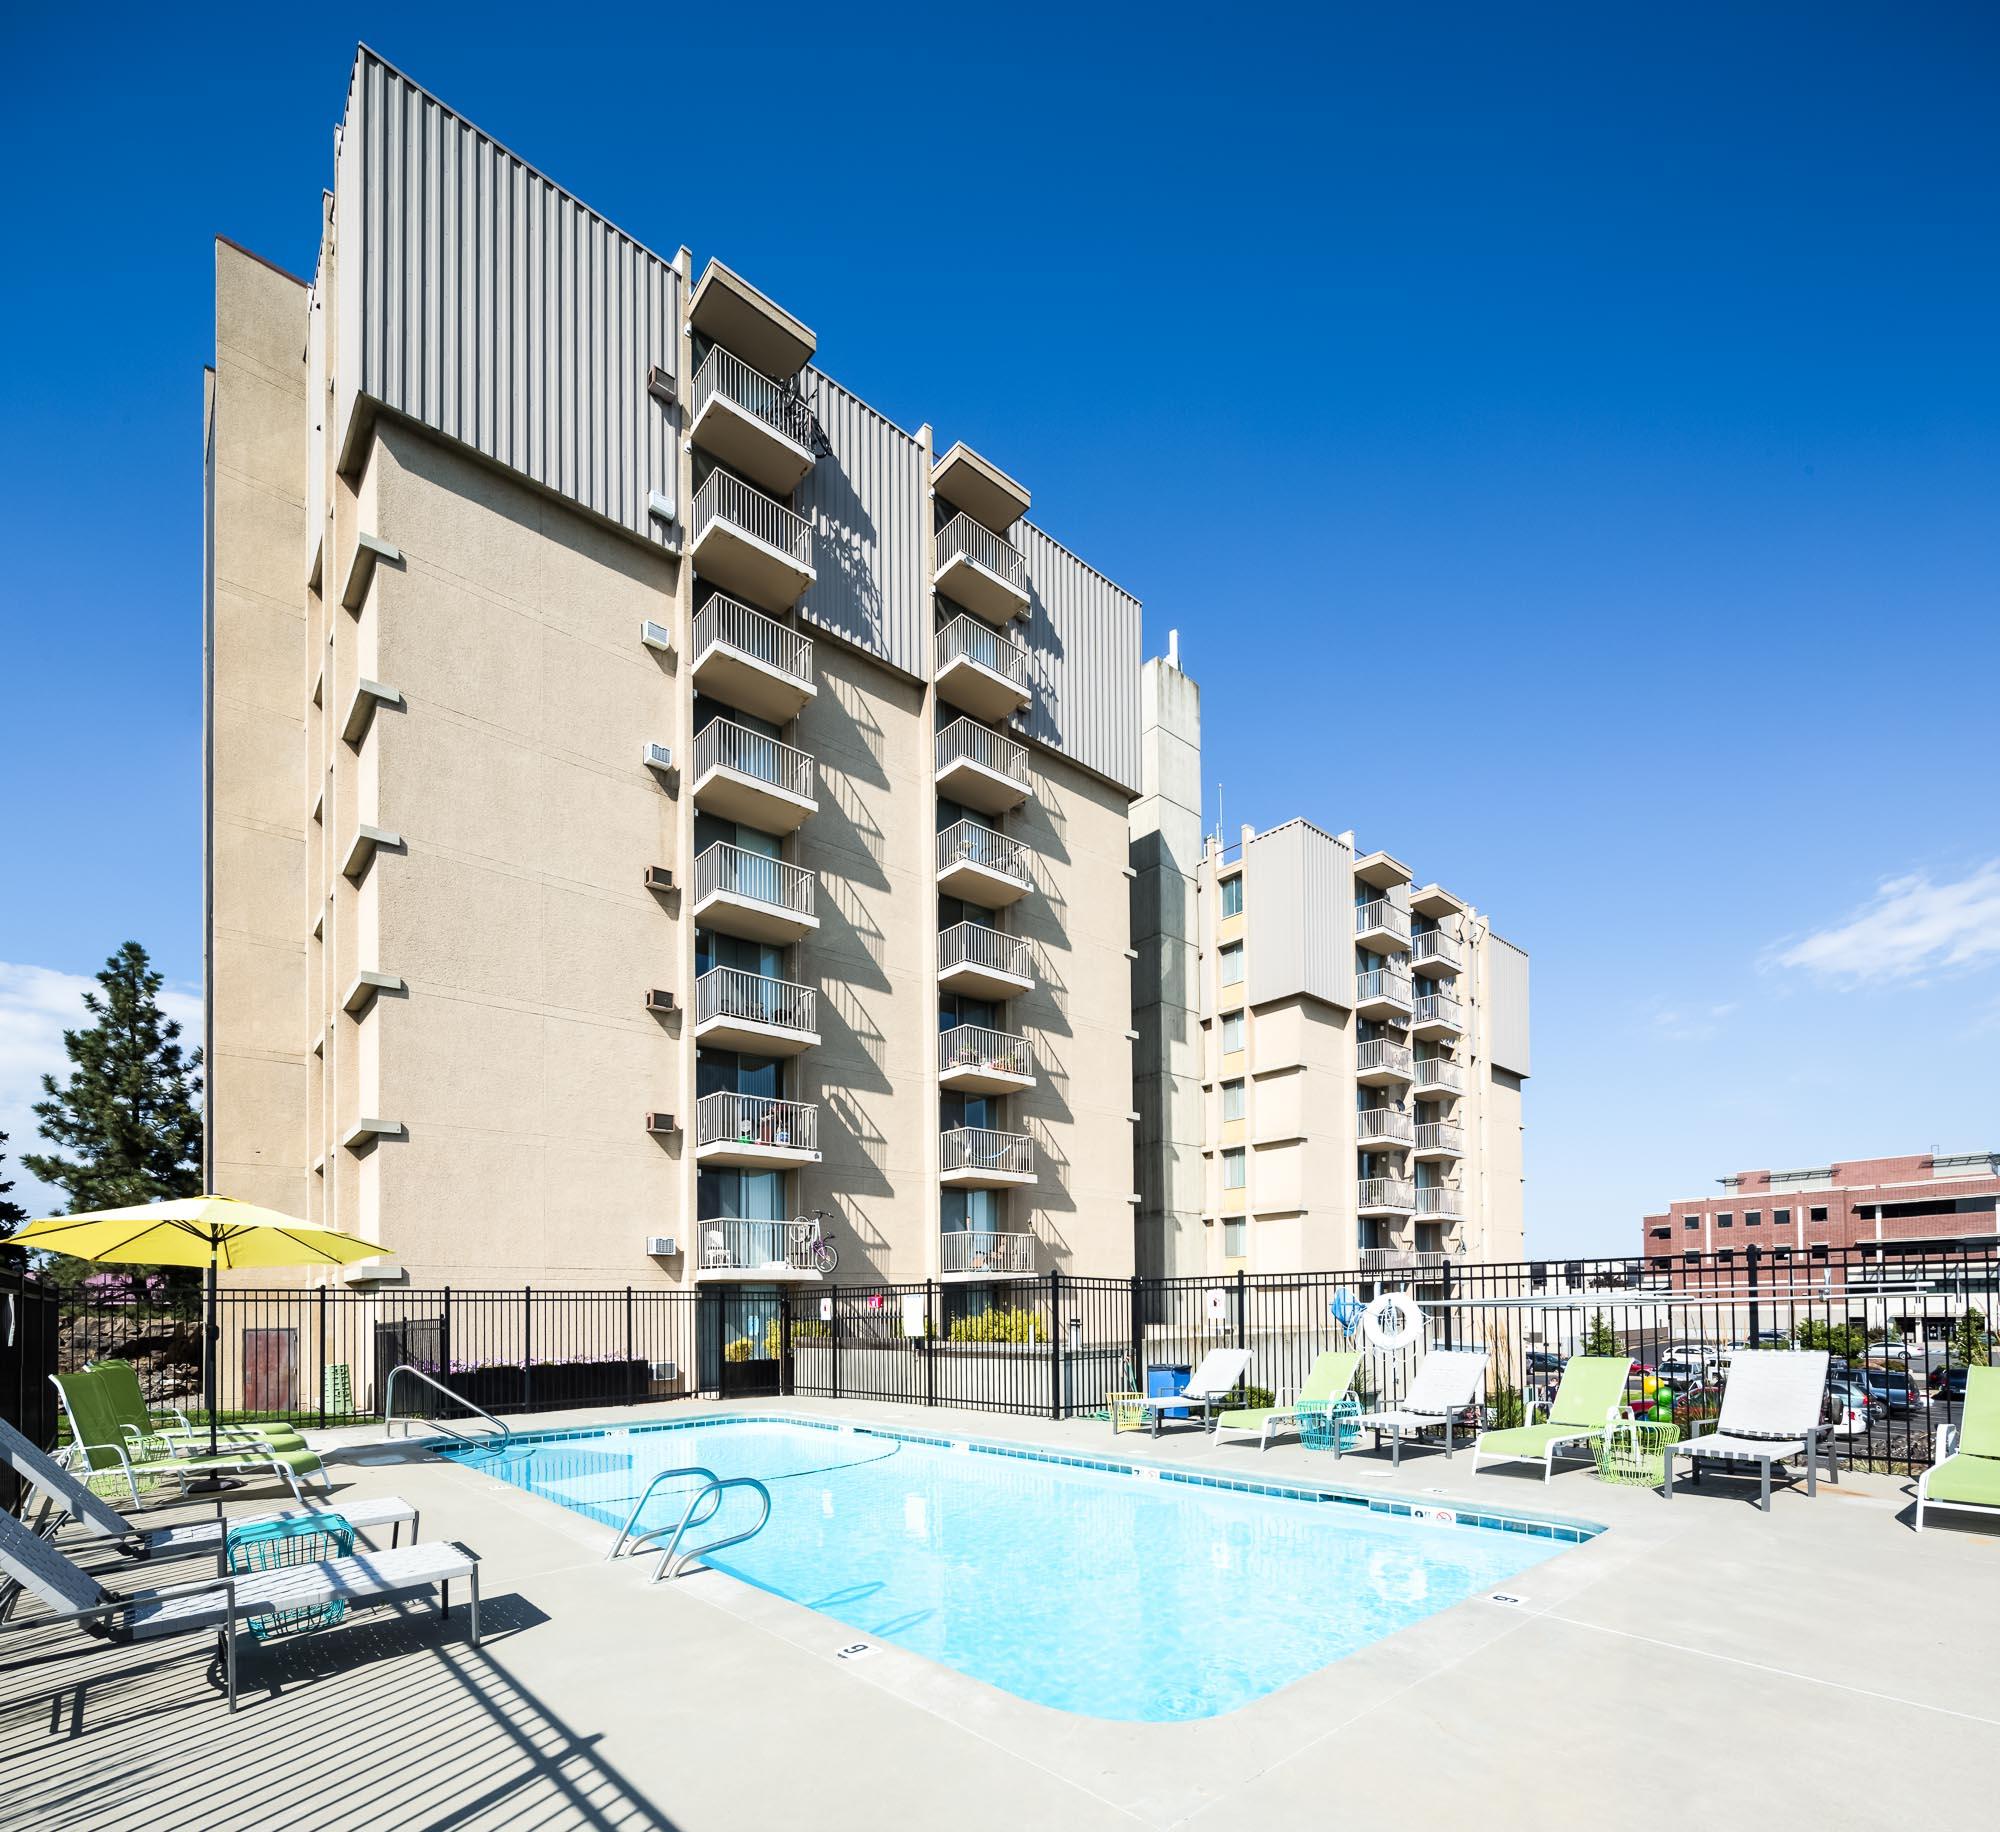 Altura Apartments Spokane Washington